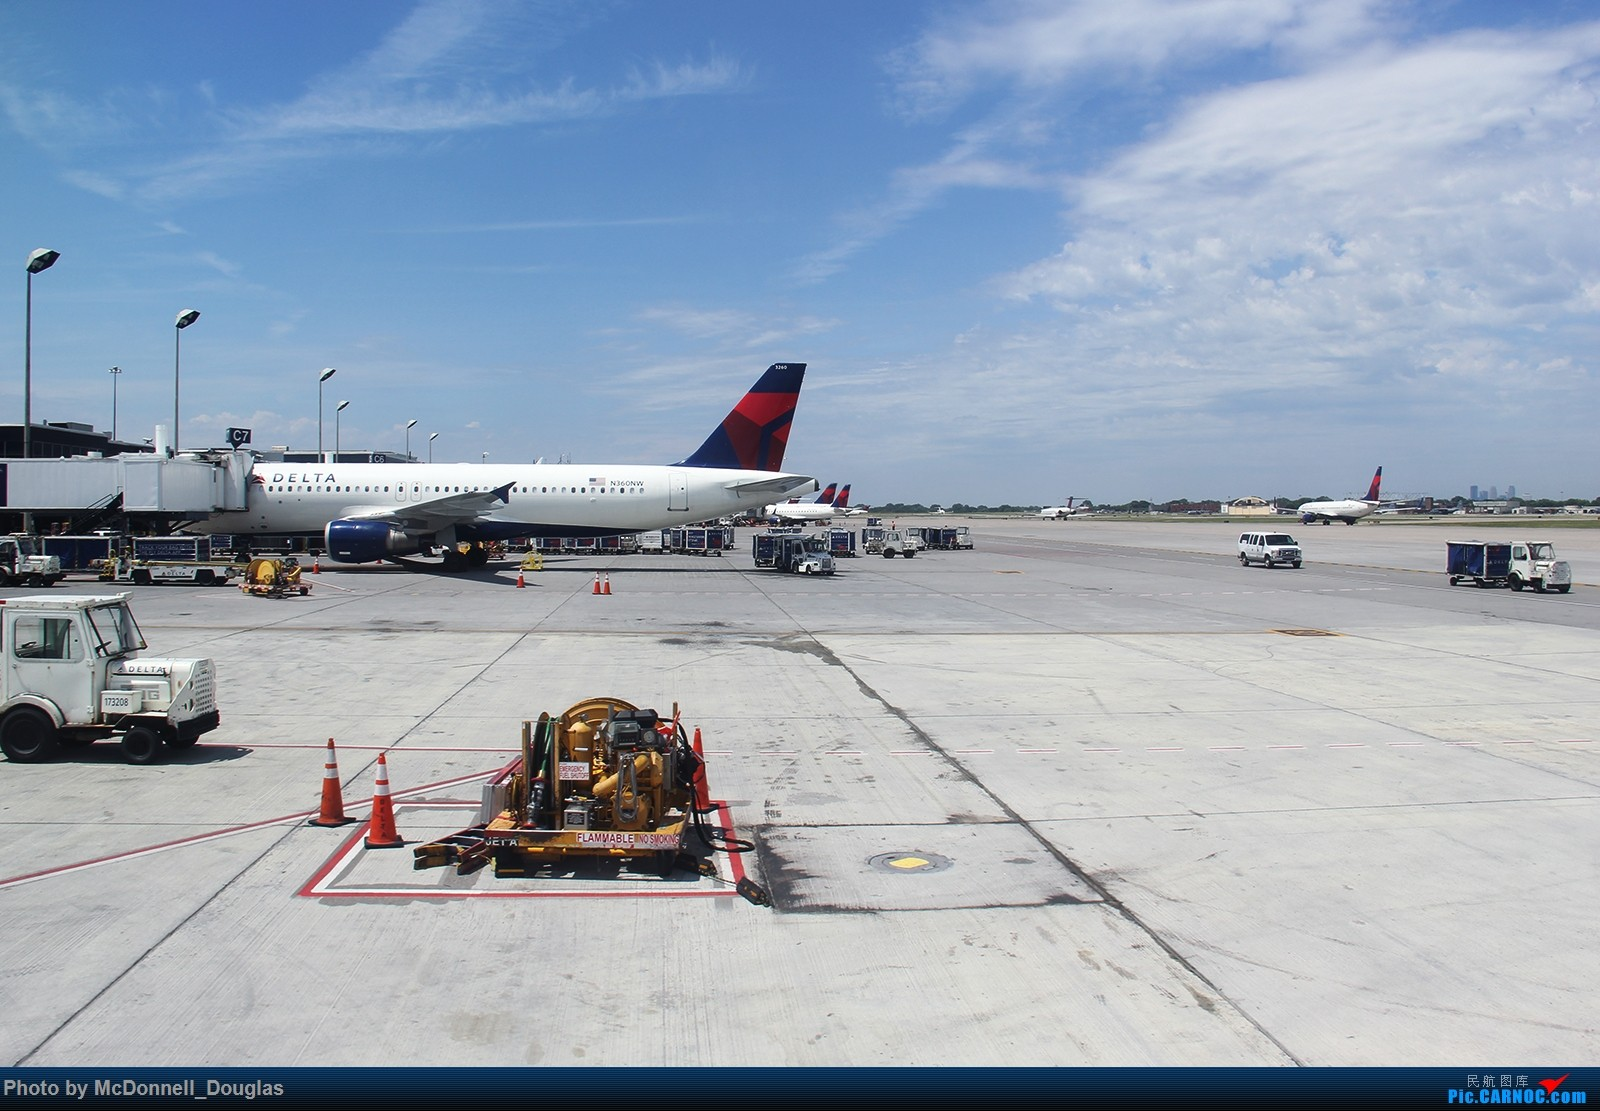 Re:[原创]【上海飞友会】图会很多,也有很多驾驶舱,杂七杂八的美帝,梦寐以求的圣马丁,这更绝不弃贴【驾驶舱已出现】 AIRBUS A320-212 N360NW 美国明尼阿波利斯—圣保罗机场